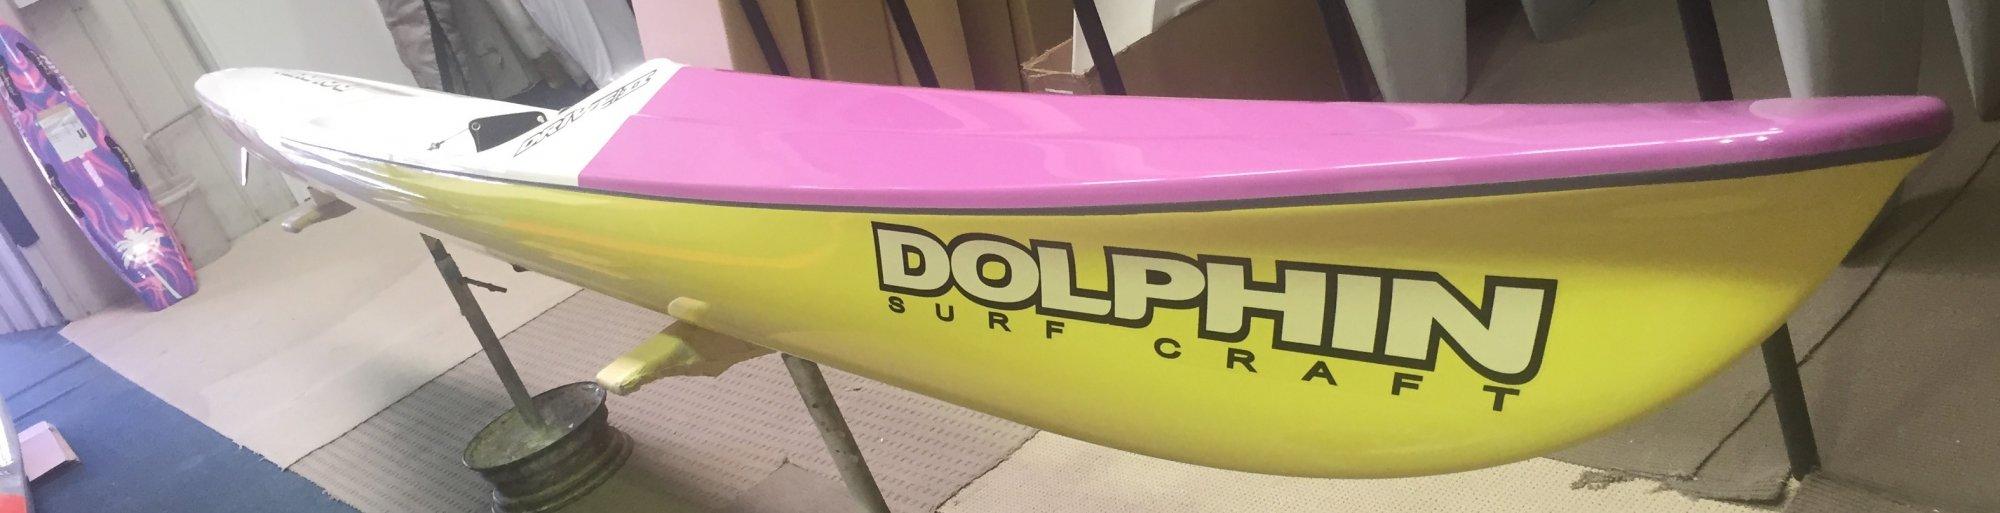 Dolphin Adjustable Drive II Surf Ski 19' -  990